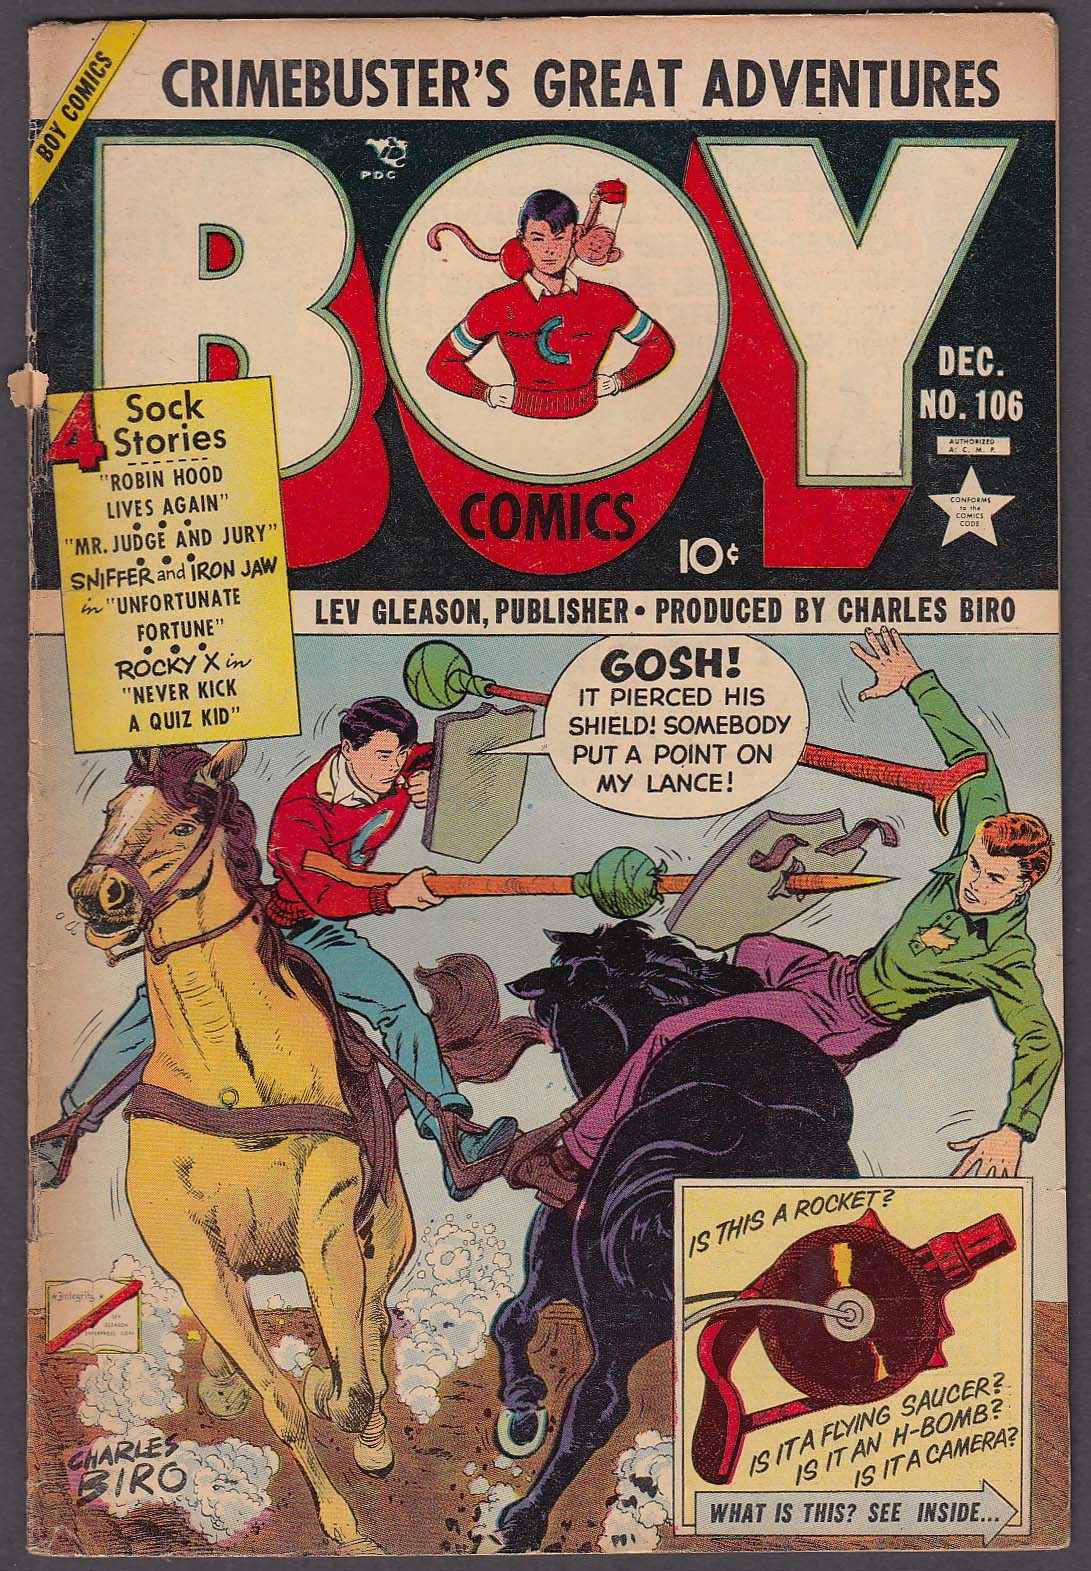 BOY Comics #106 comic book 12/7 1953